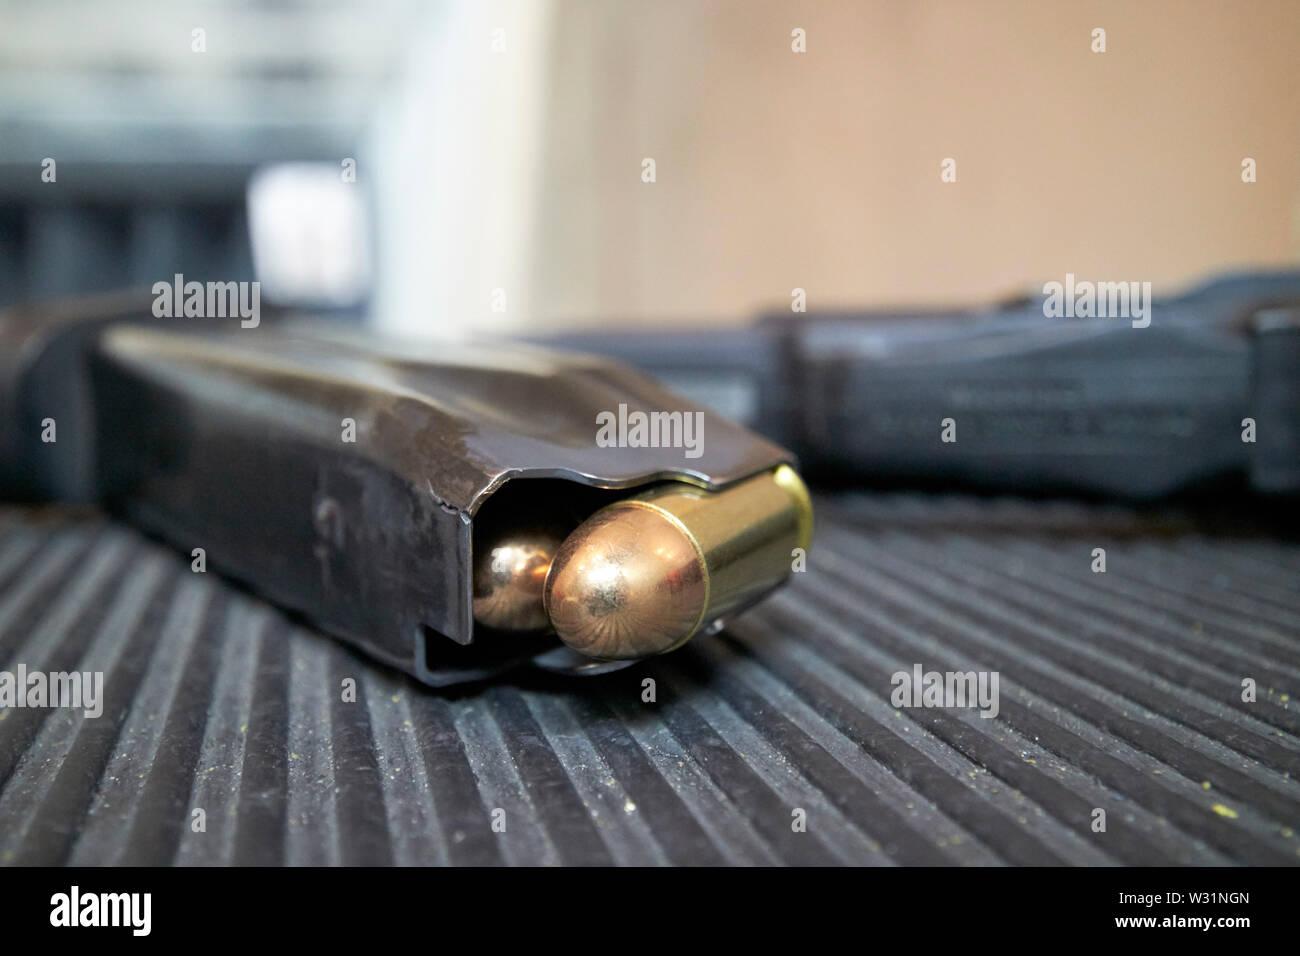 Gun Magazine Stock Photos & Gun Magazine Stock Images - Alamy